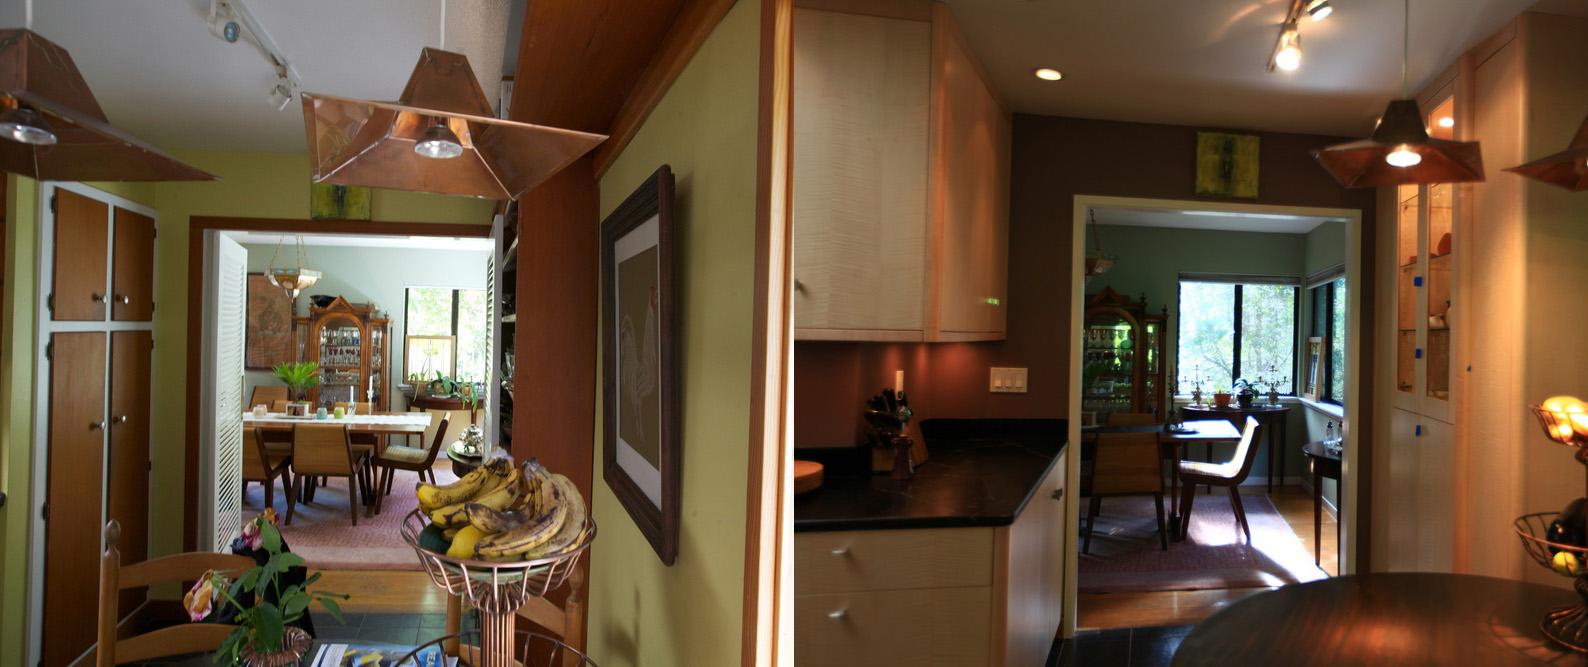 Kitchen1_Both.jpg